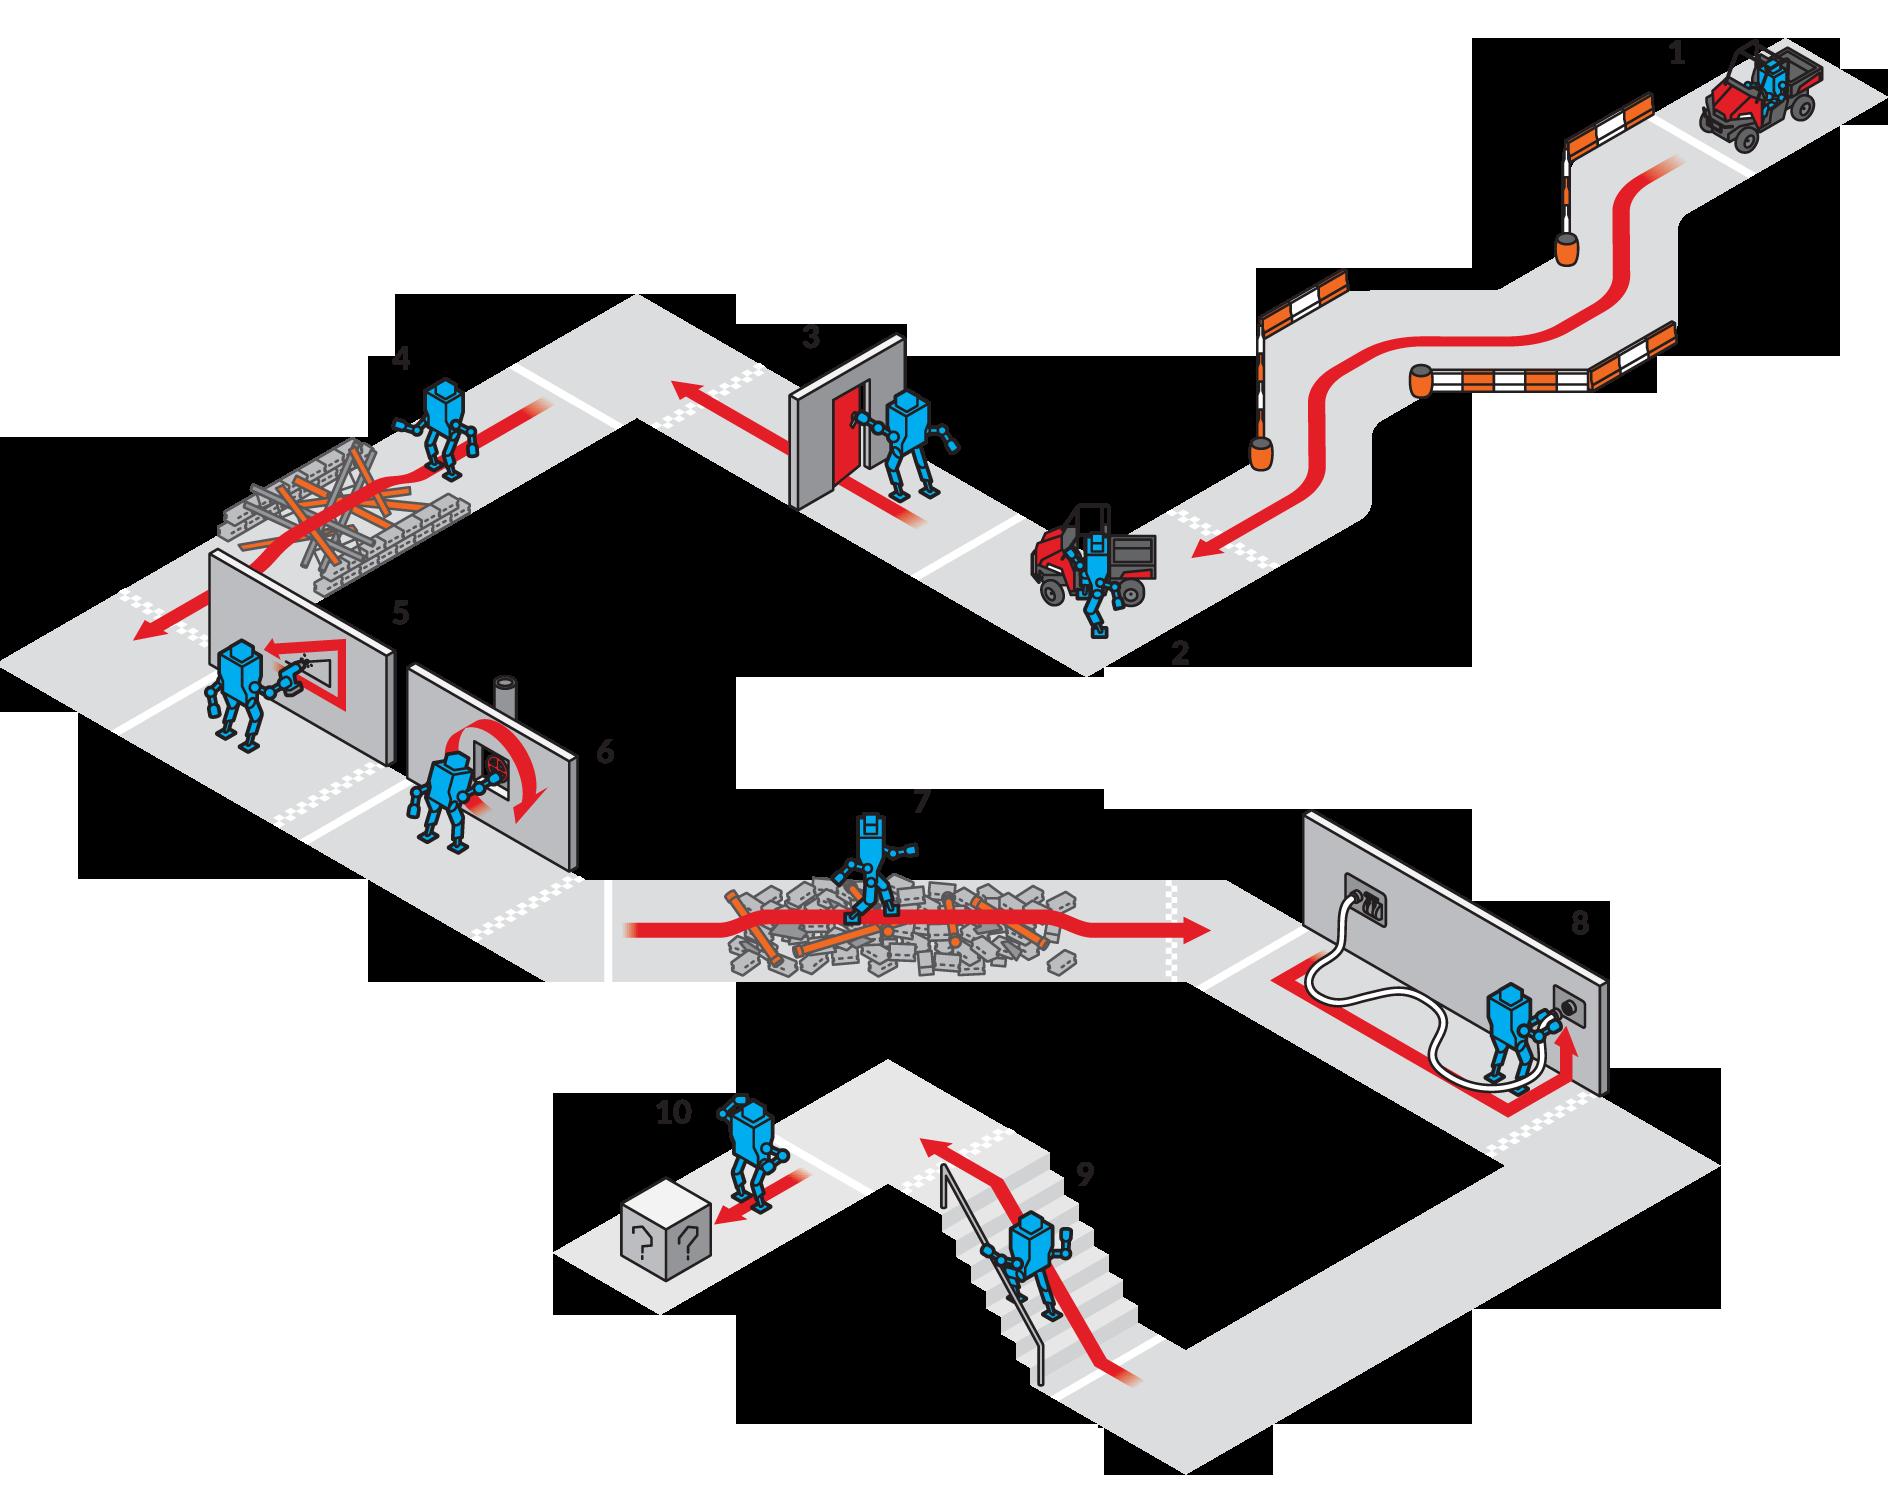 map of DARPA robotics challenge course